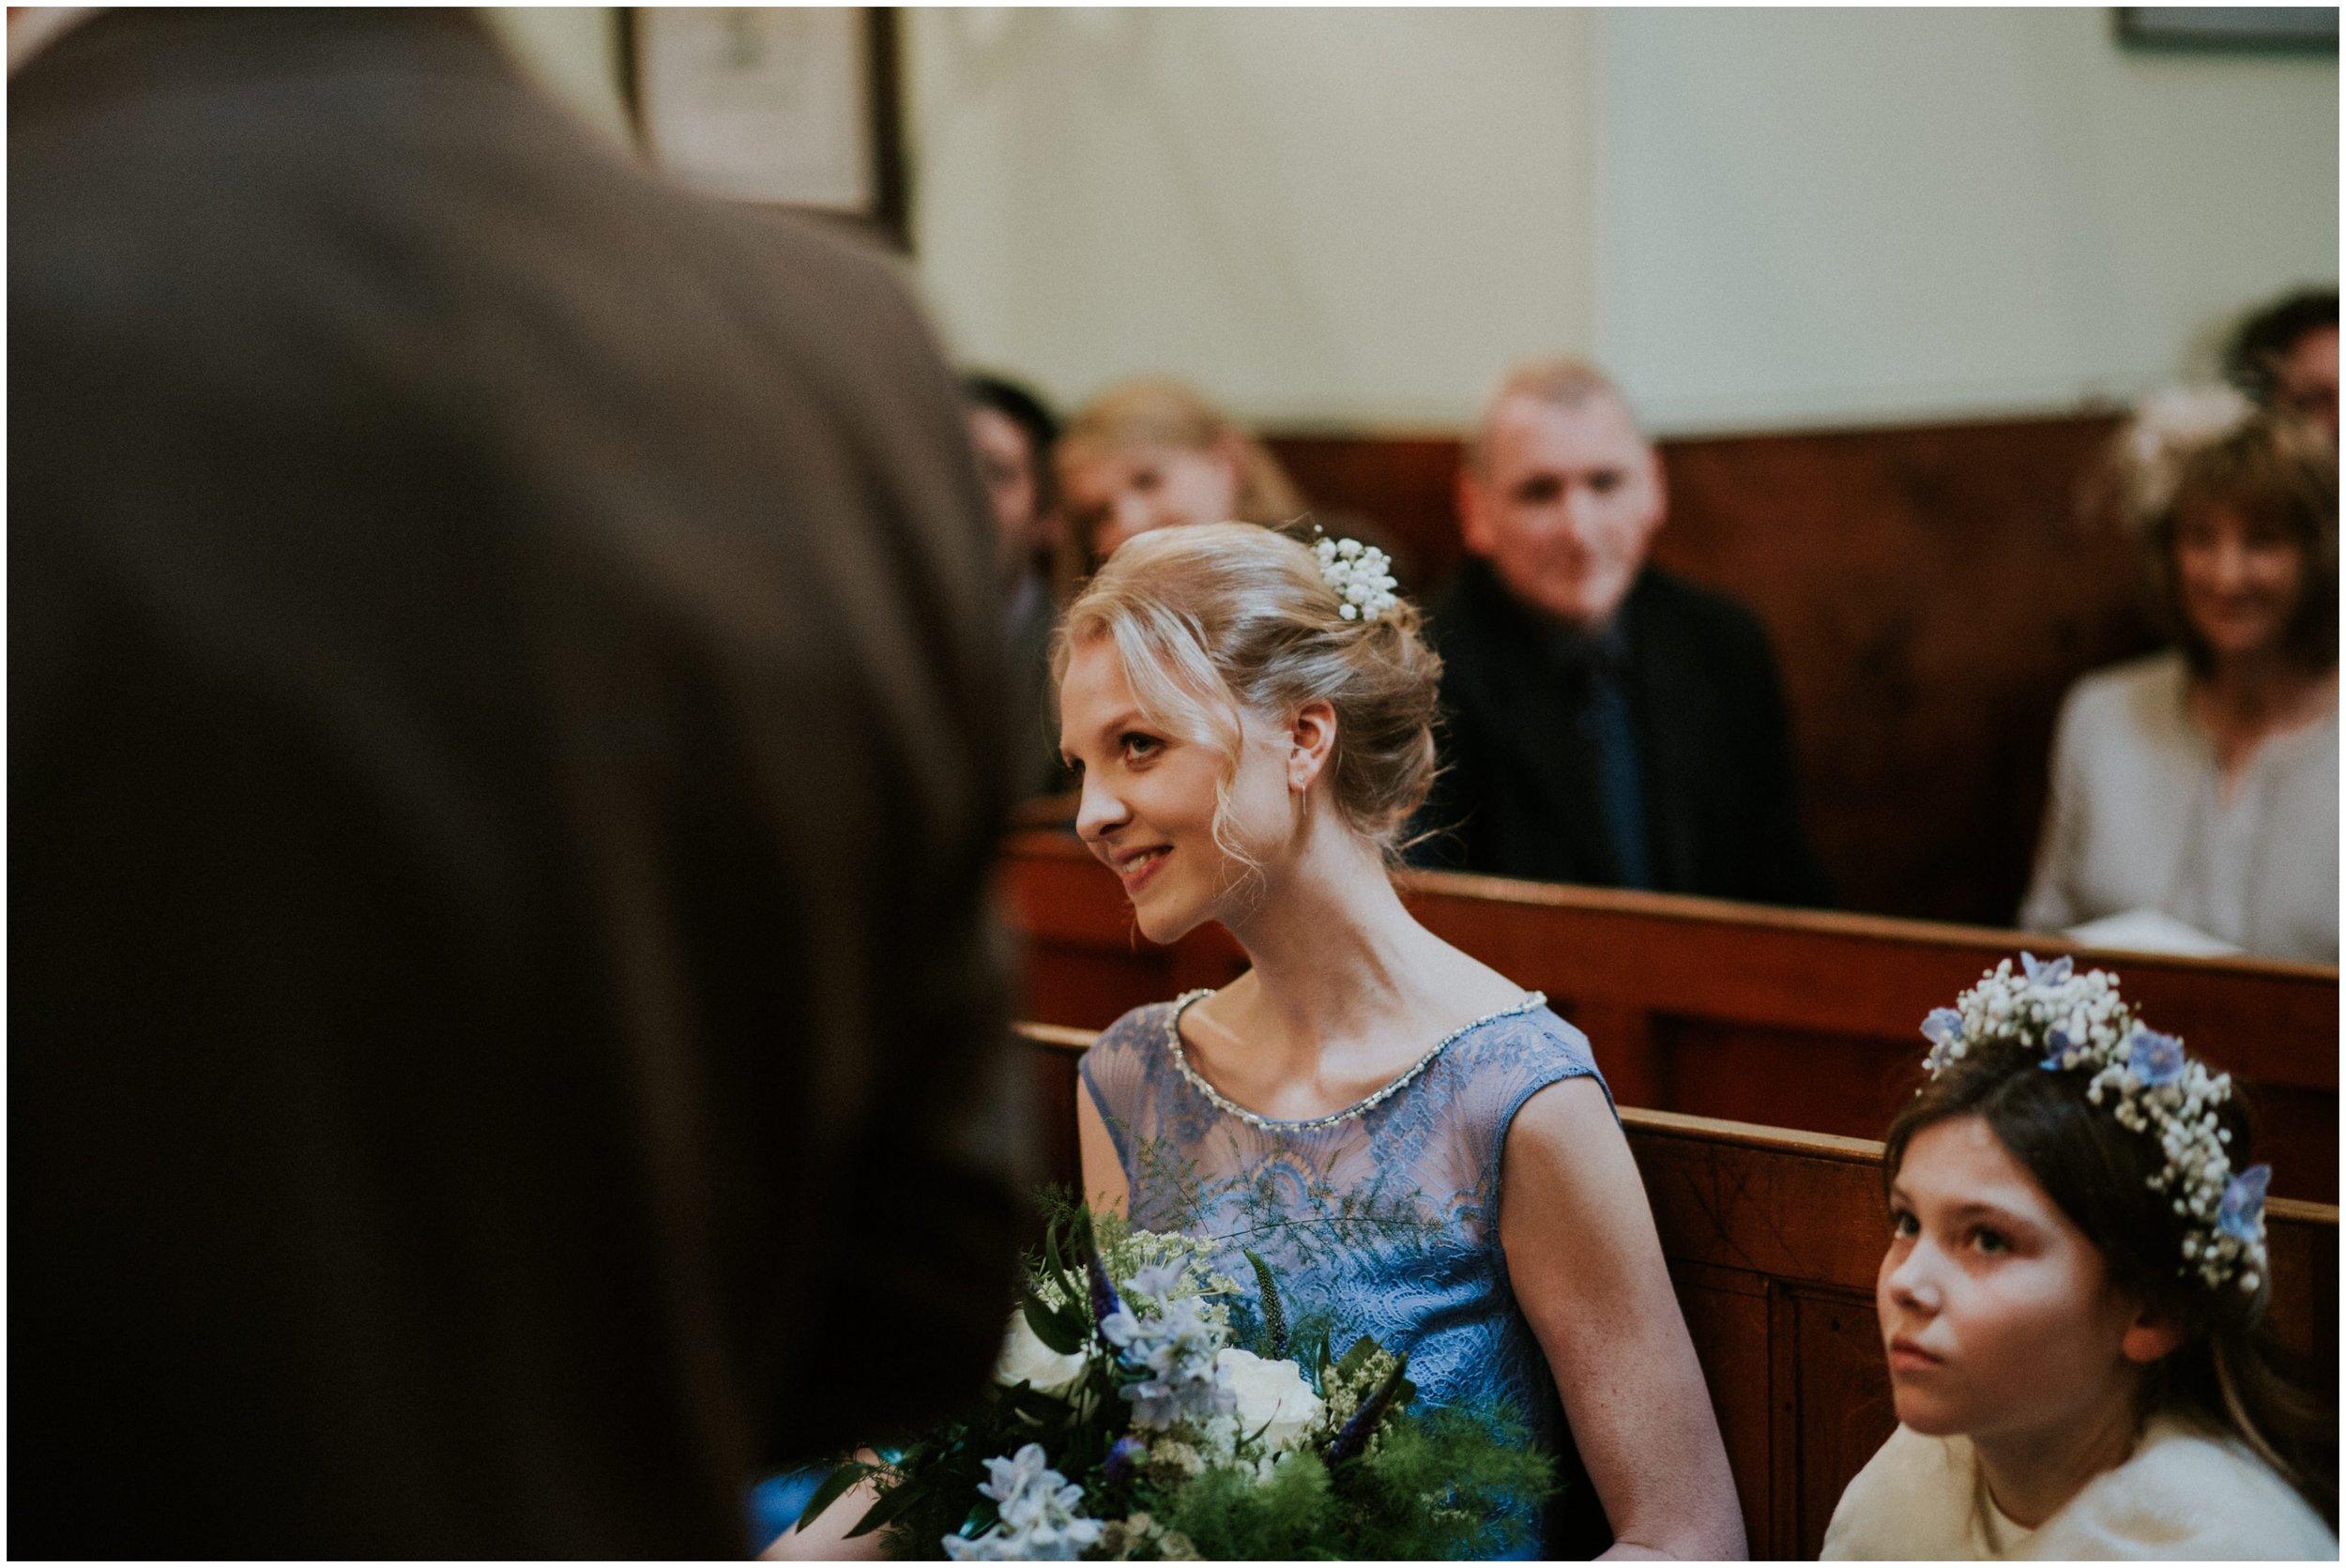 Photography 78 - Glasgow Wedding Photographer - Dave & Alana_0035.jpg